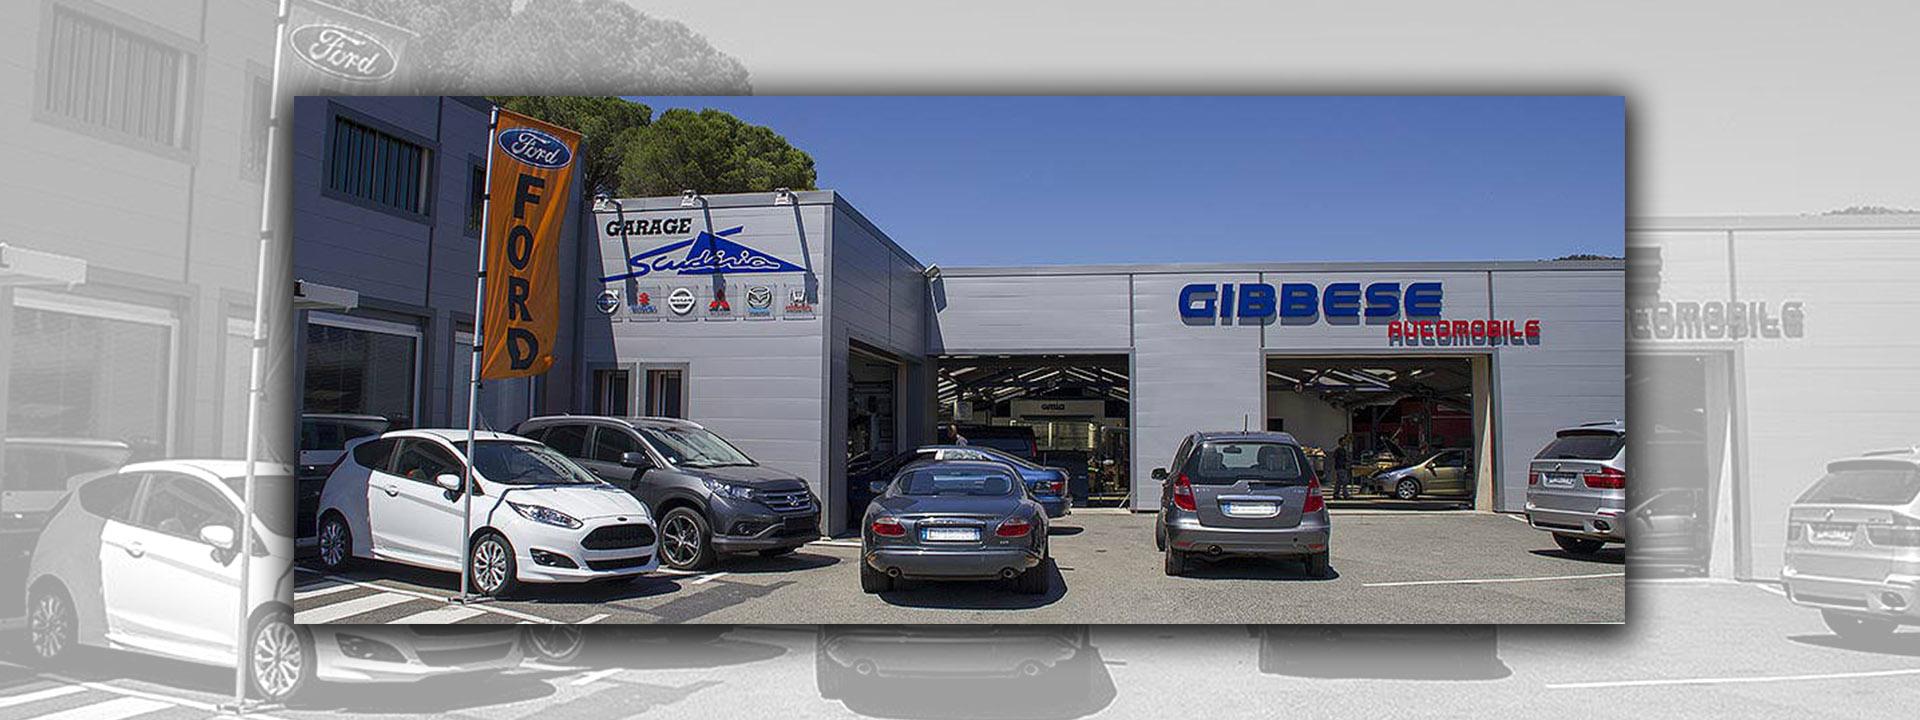 Garage carrosserie automobile gibbese sainte maxime for Garage la carrosserie toulon